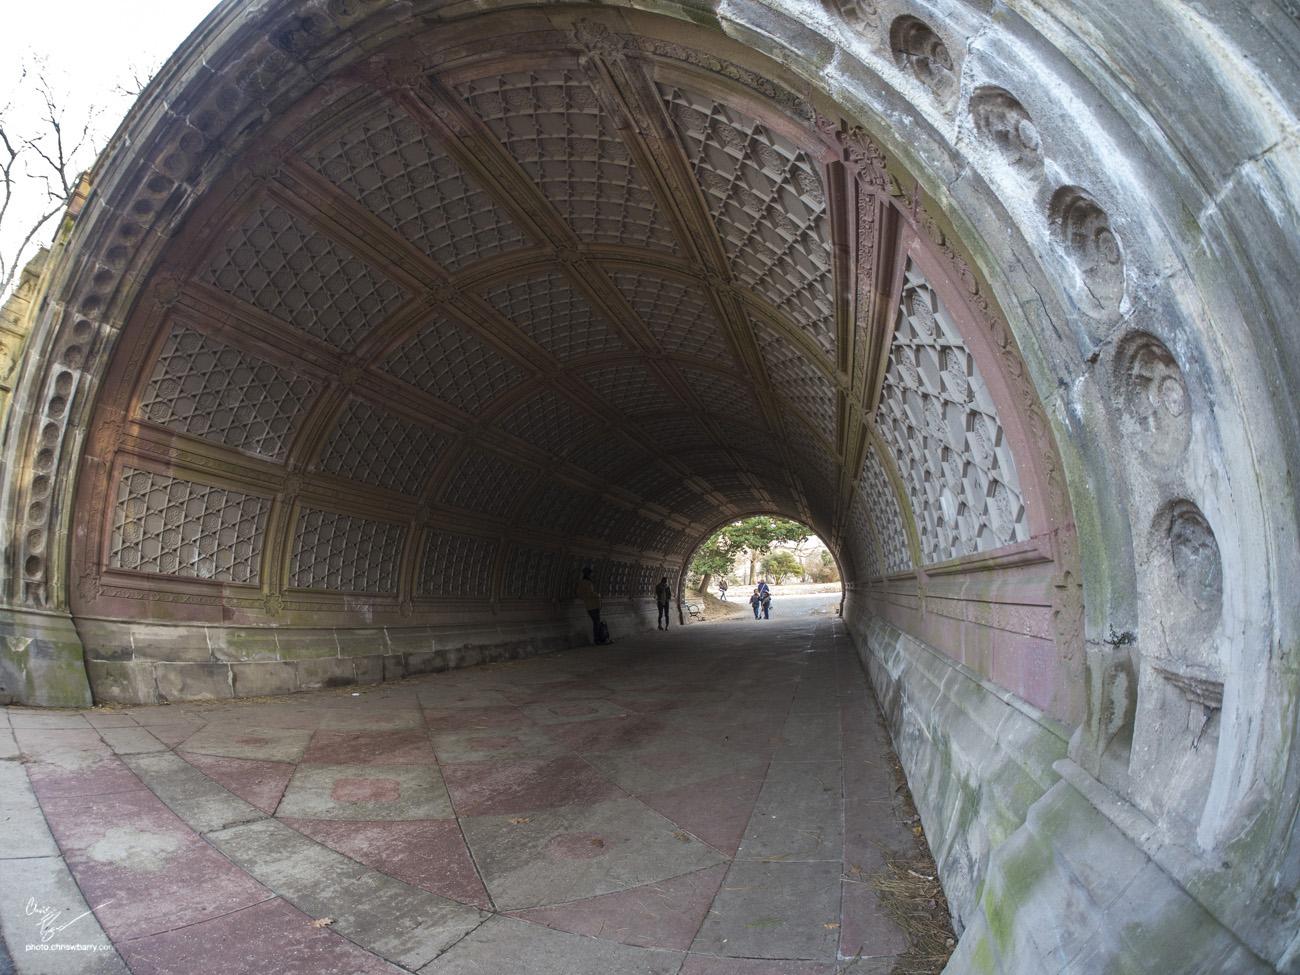 1-21-18: Tunnel